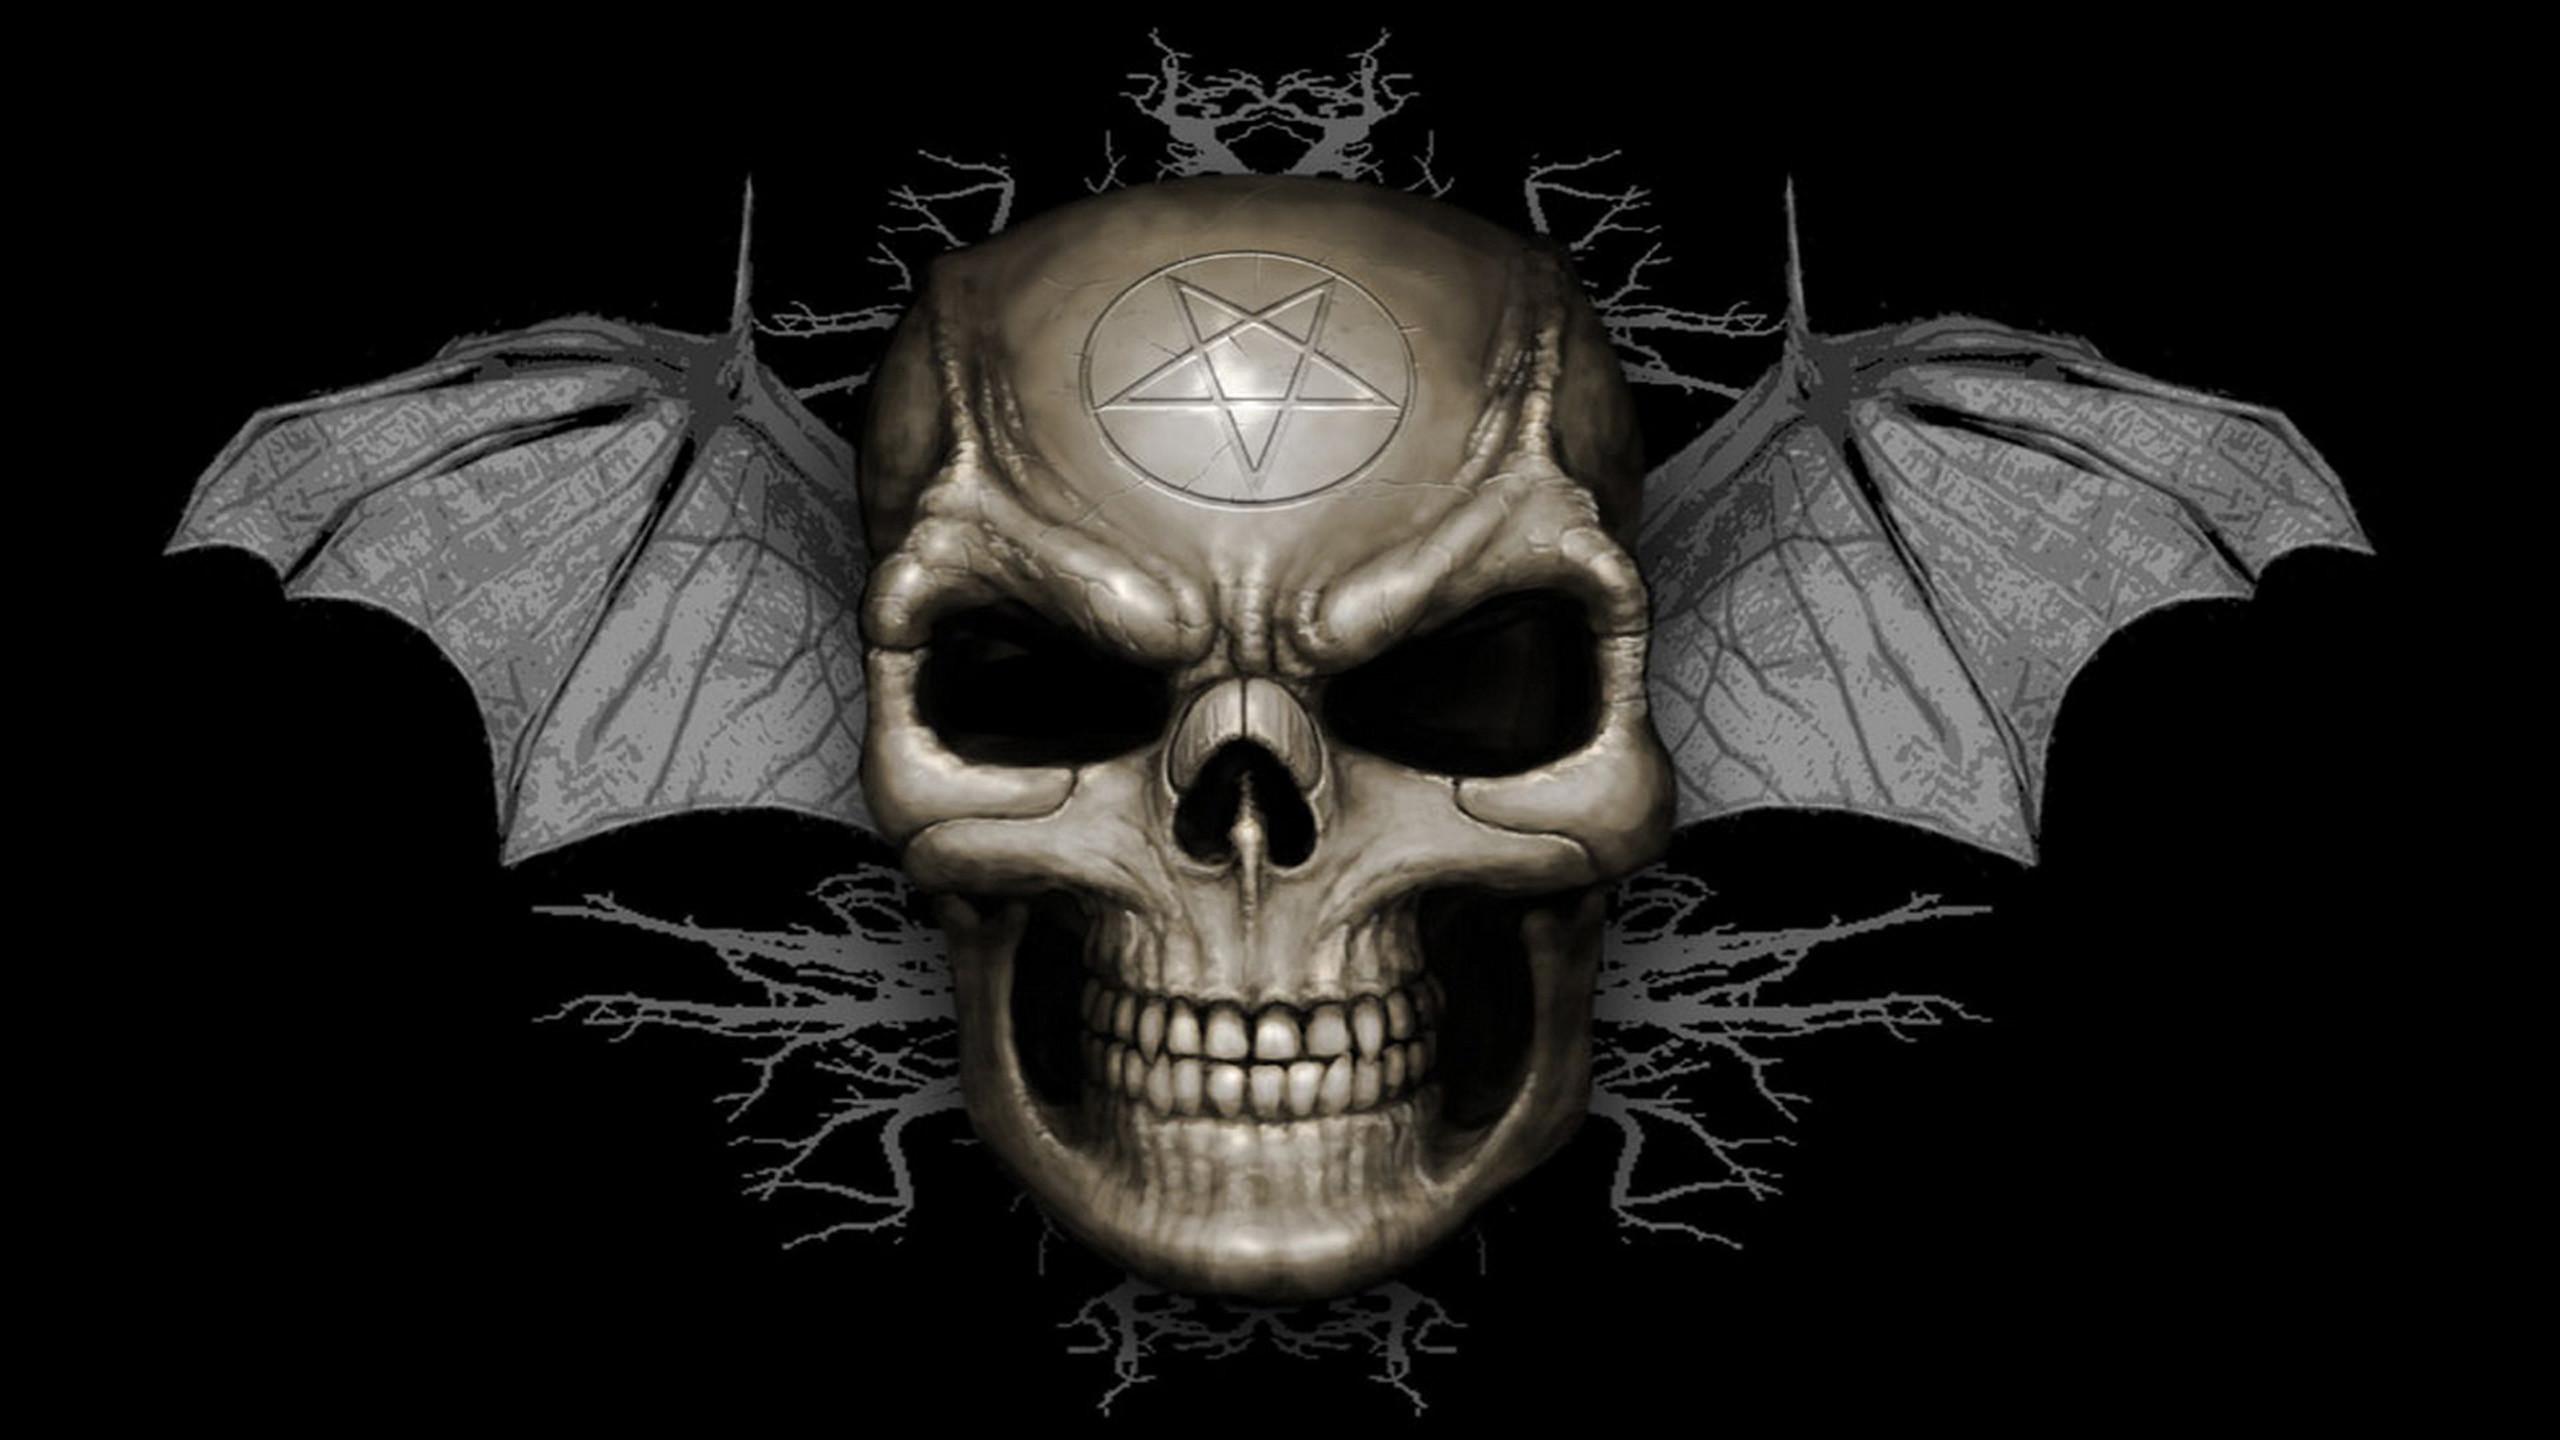 Evil skull bat wallpapers, HD Desktop Wallpapers